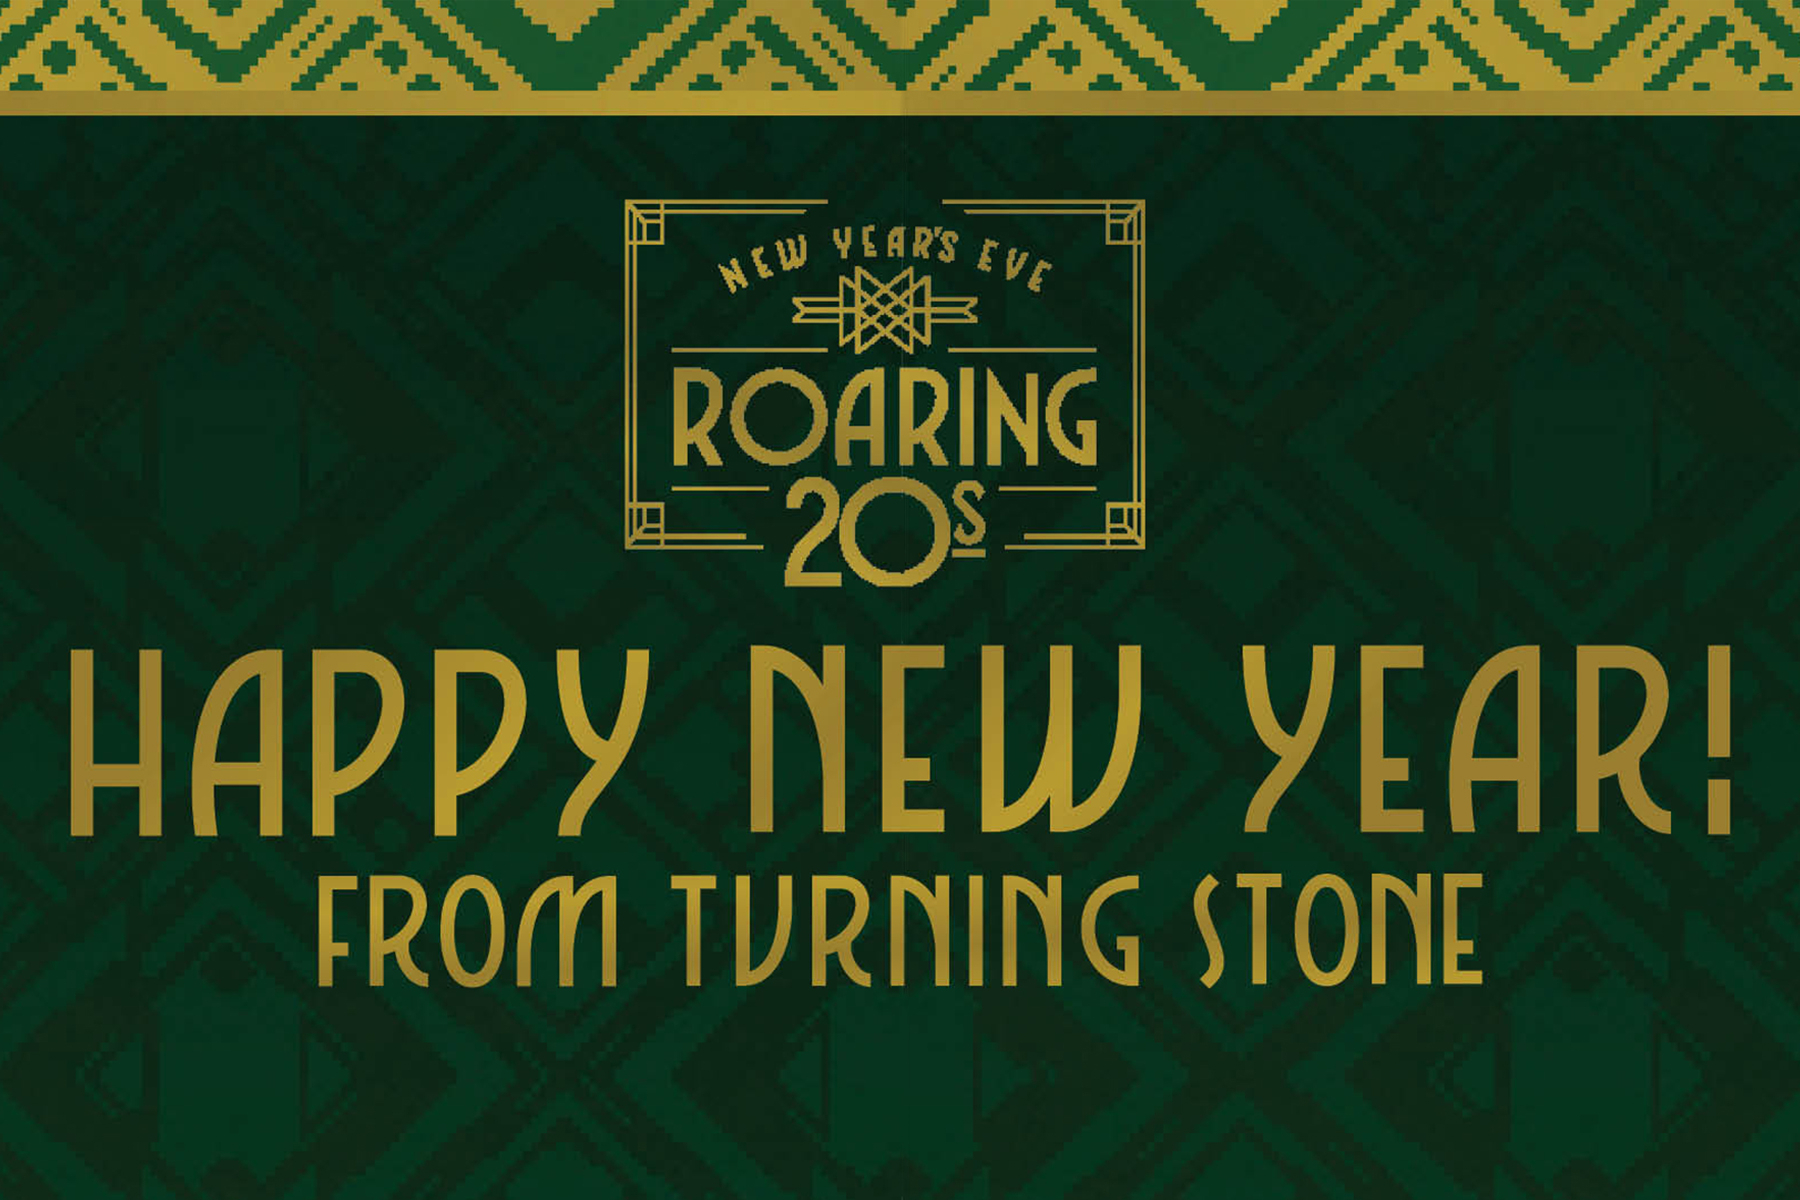 Turning Stone March Bingo Calendar | Printable Calendar 2021-2022 with regard to Turning Stone Bingo Games For Oct.24